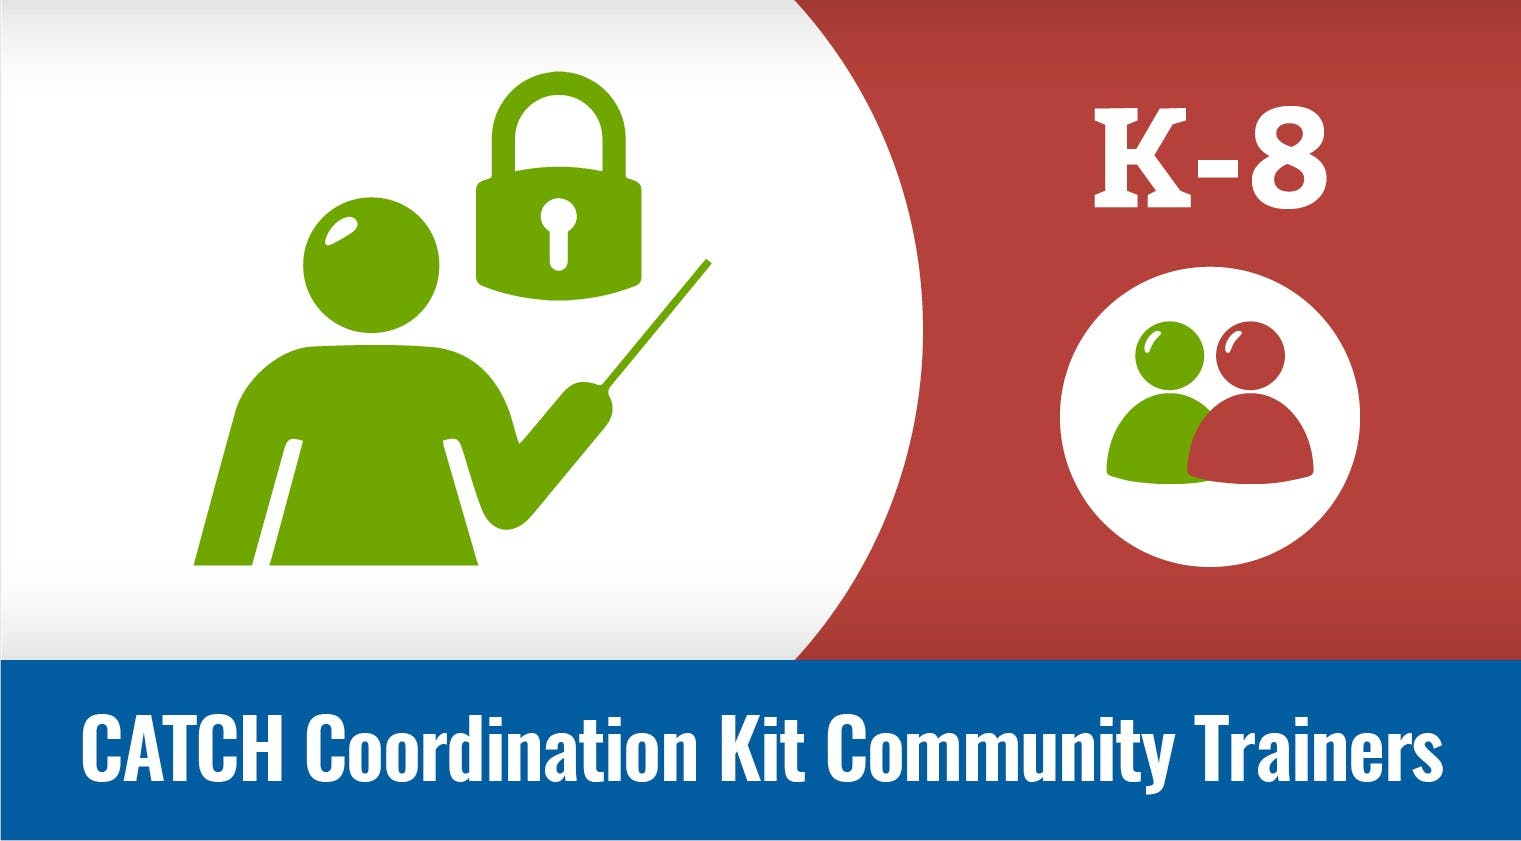 Community Trainers - CATCH Coordination Kit